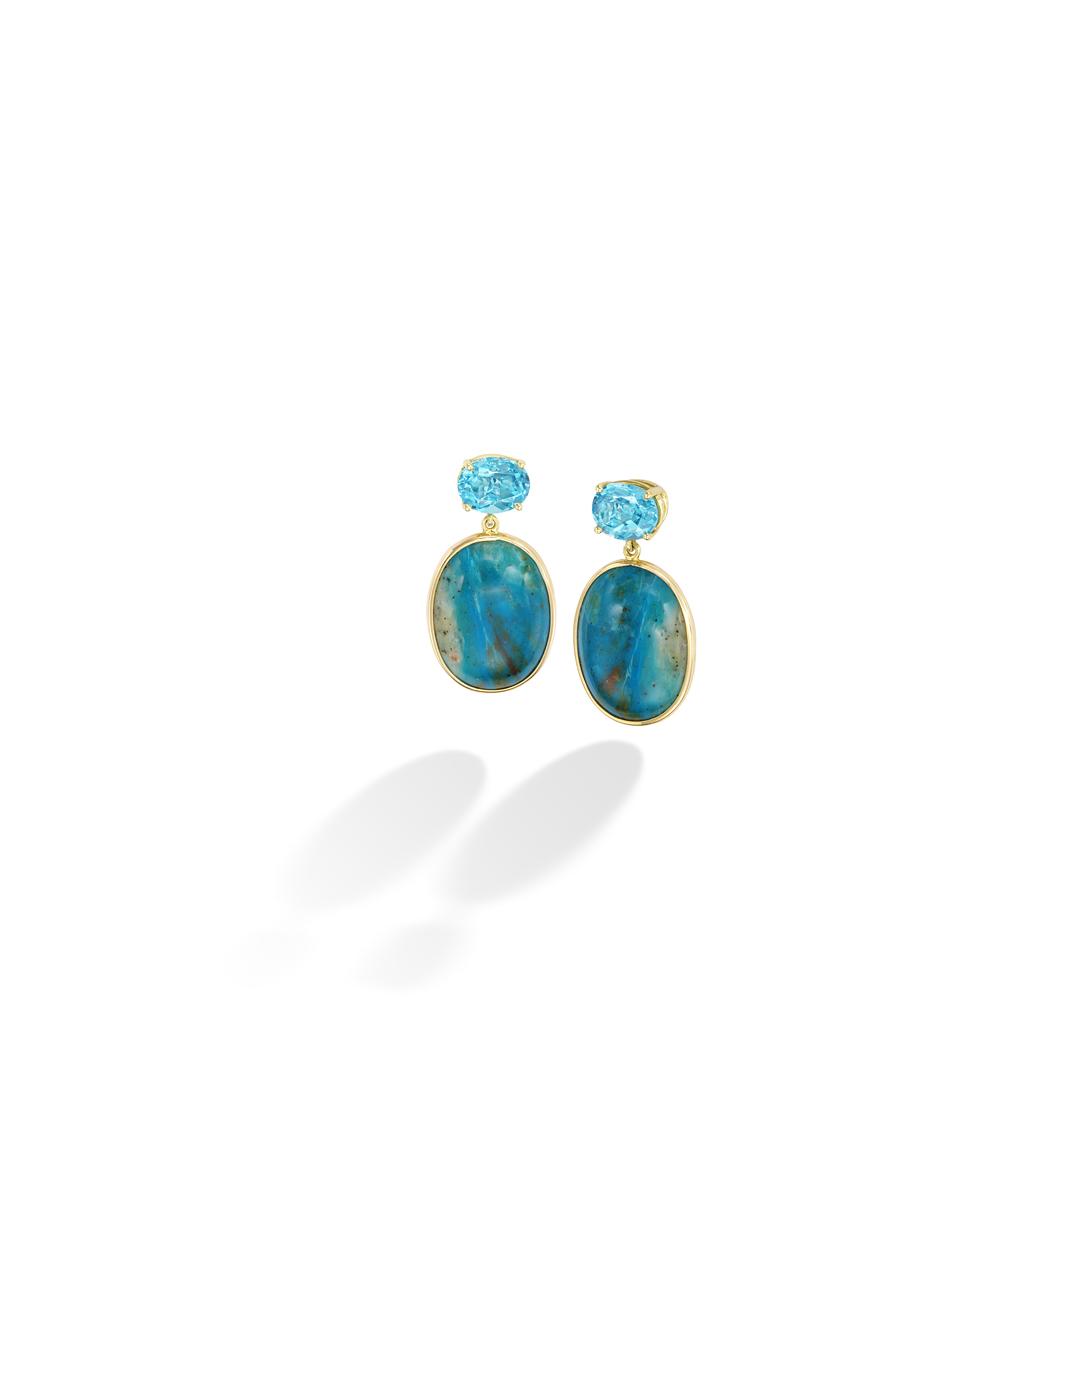 mish_products_earrings_Xanadu-Bltopaz-PeruvianOpal-ER-1